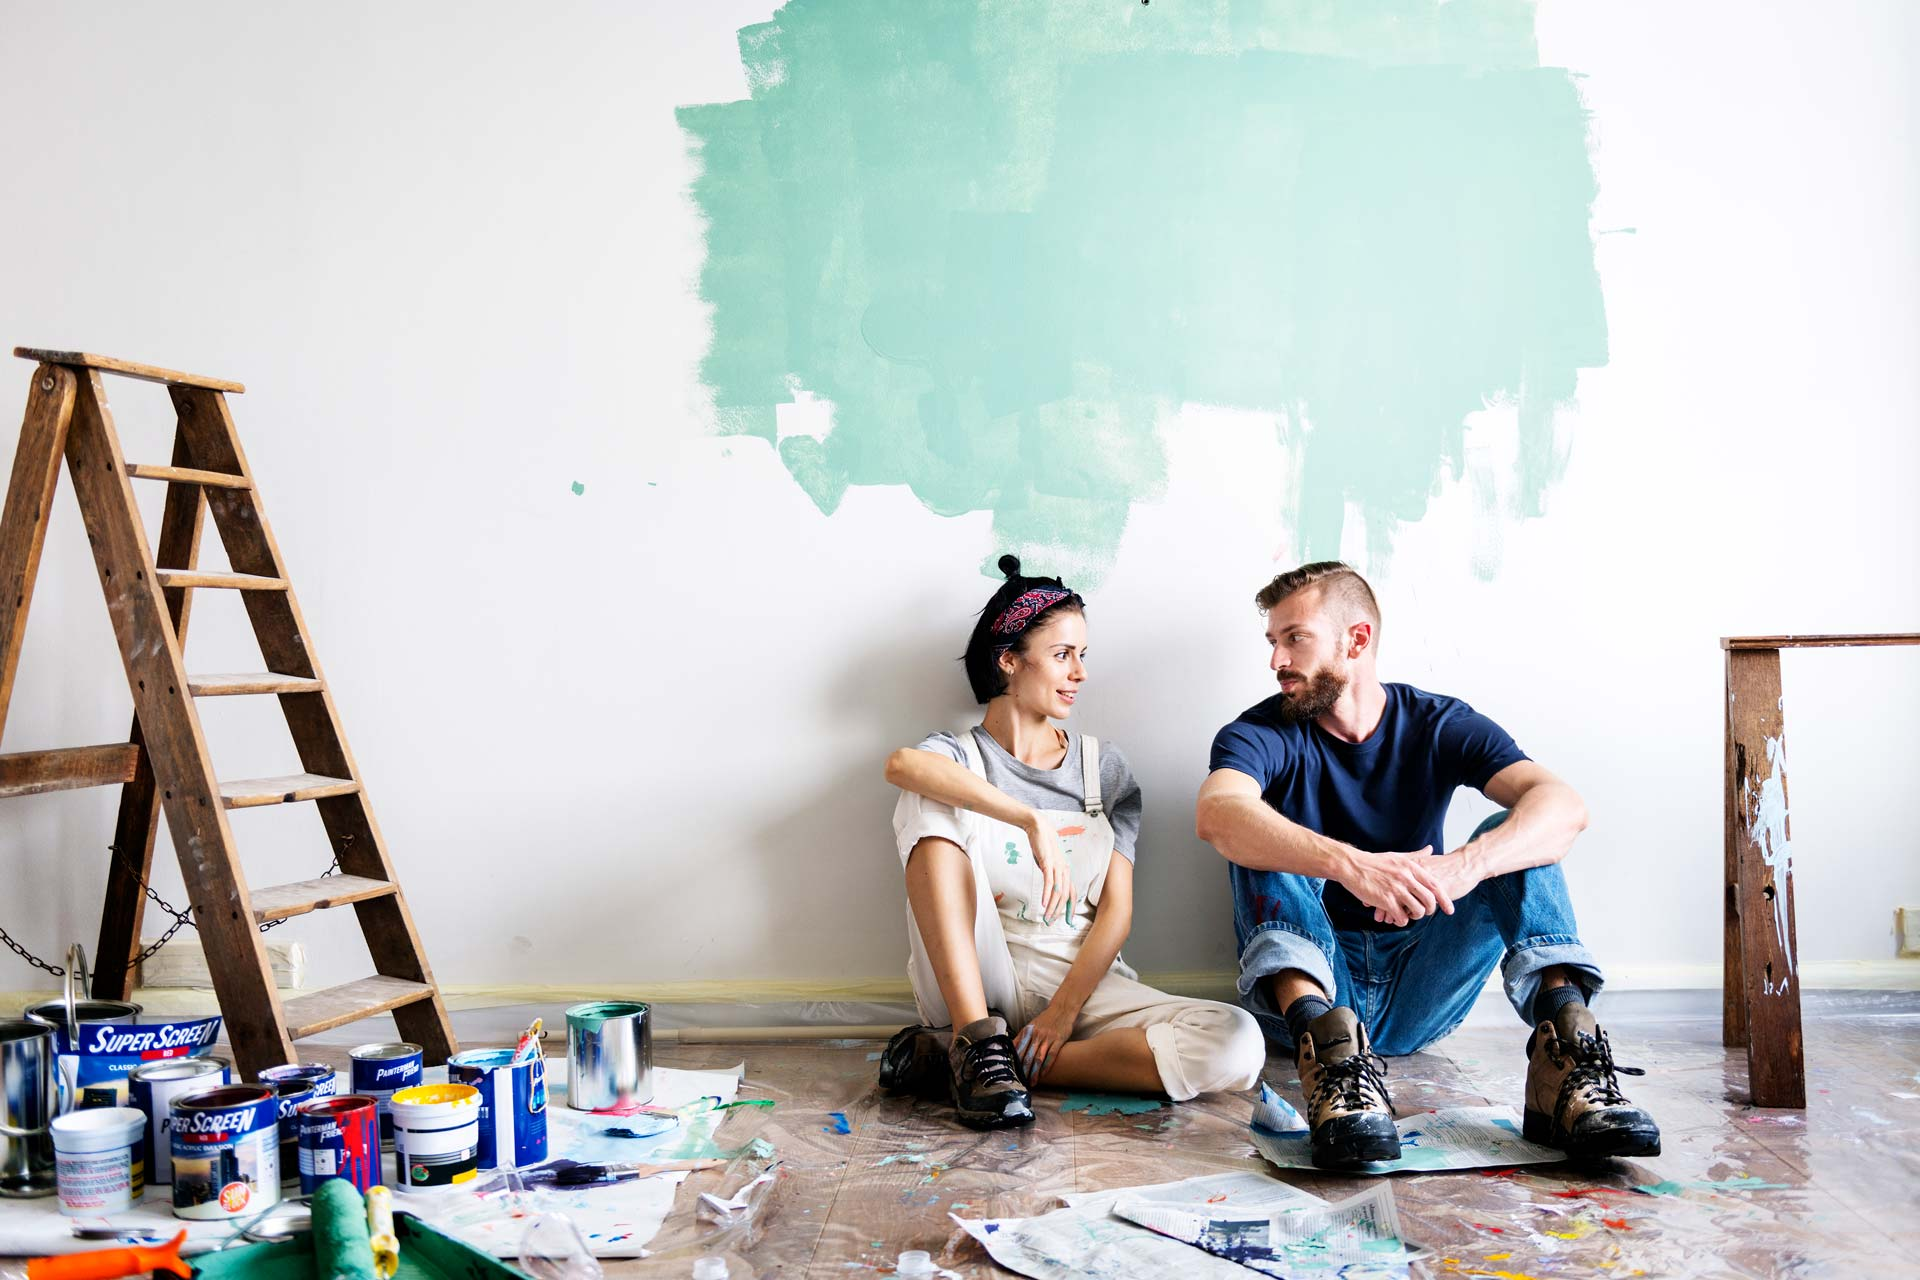 Vernici Ecologiche Per Interni pitture murali per interni ed esterni | samperio vernici